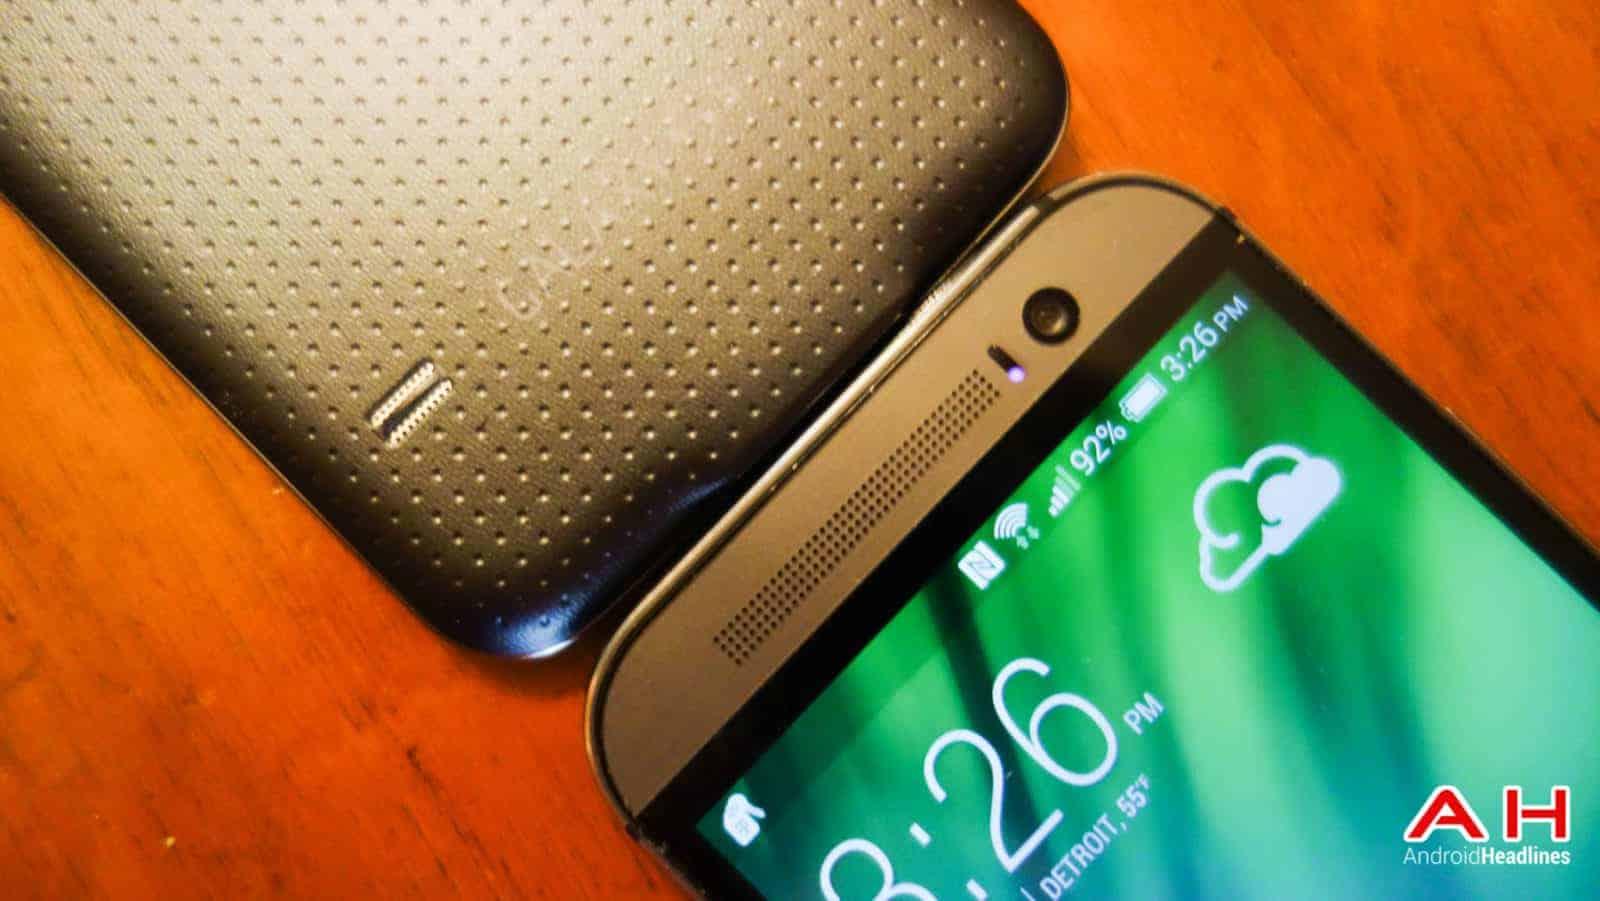 Samsung-Galaxy-S5-vs-HTC-One-M8-AH-4